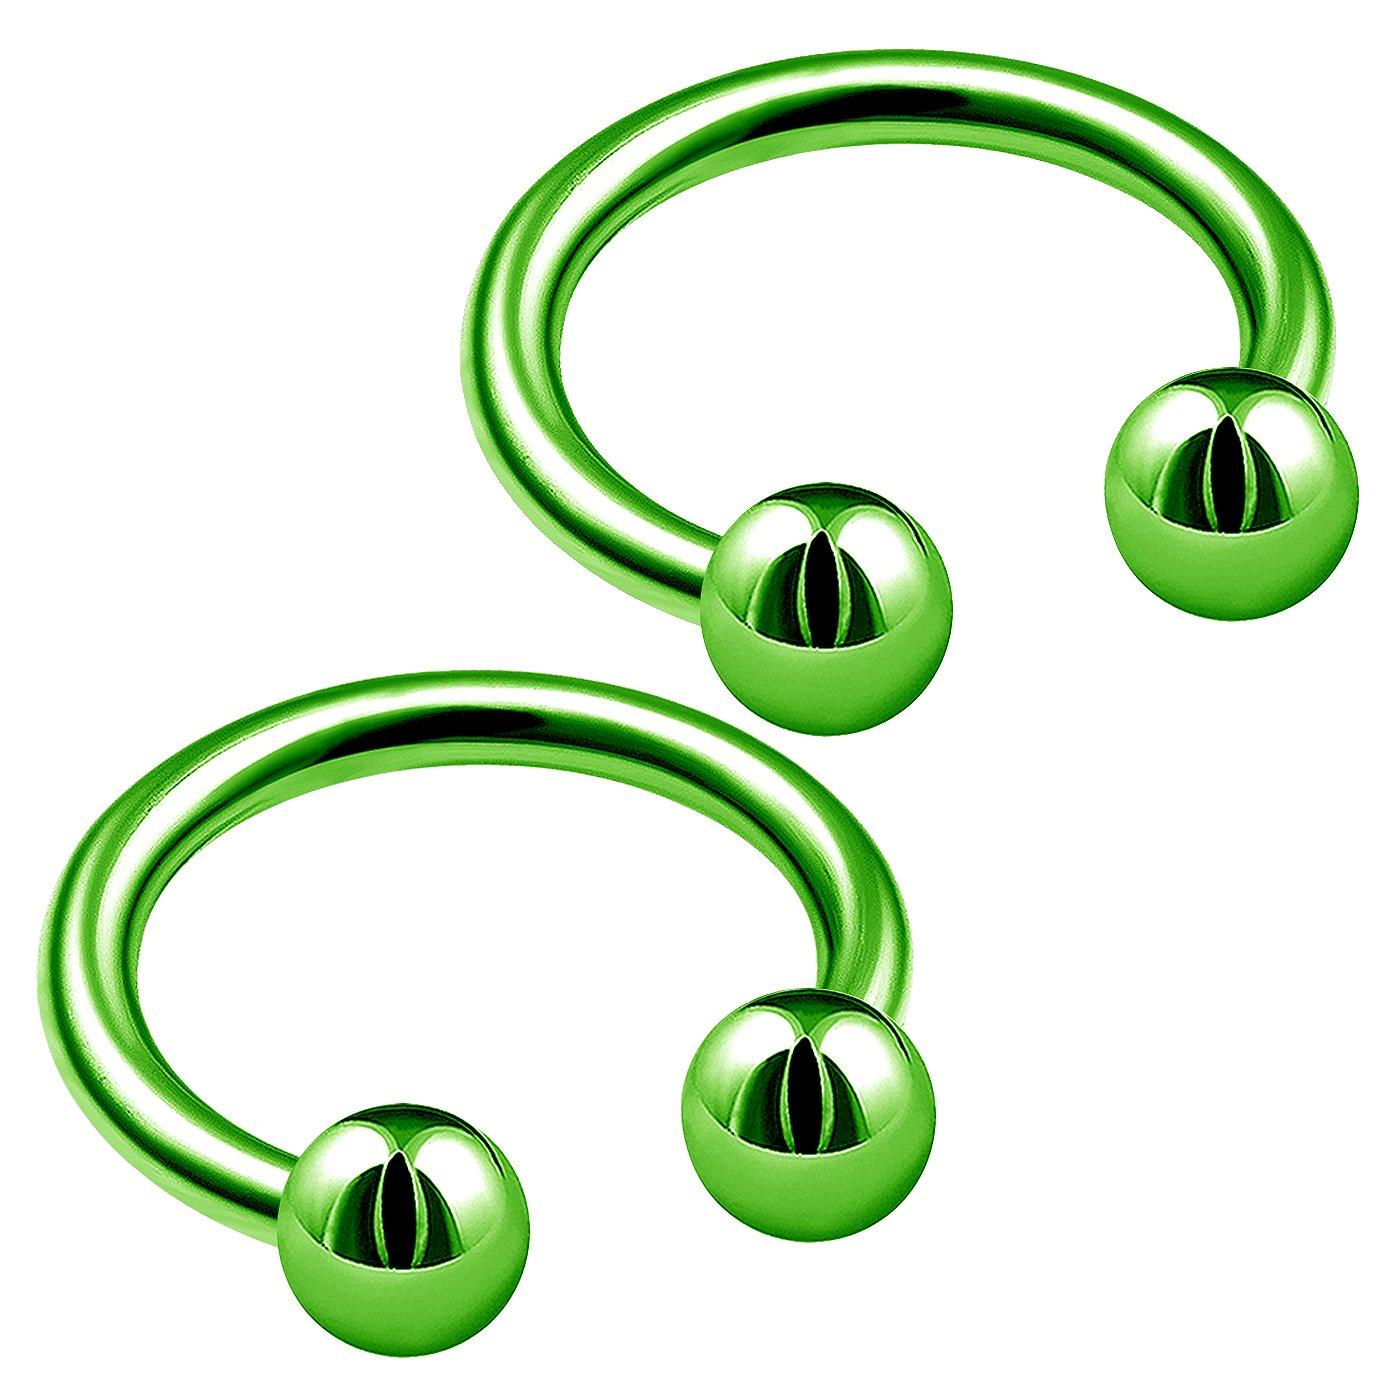 bodyjewellery 2pcs 16g circular barbell septum snake nose ring eyebrow ear tragus lip helix B2MCJ Pick color